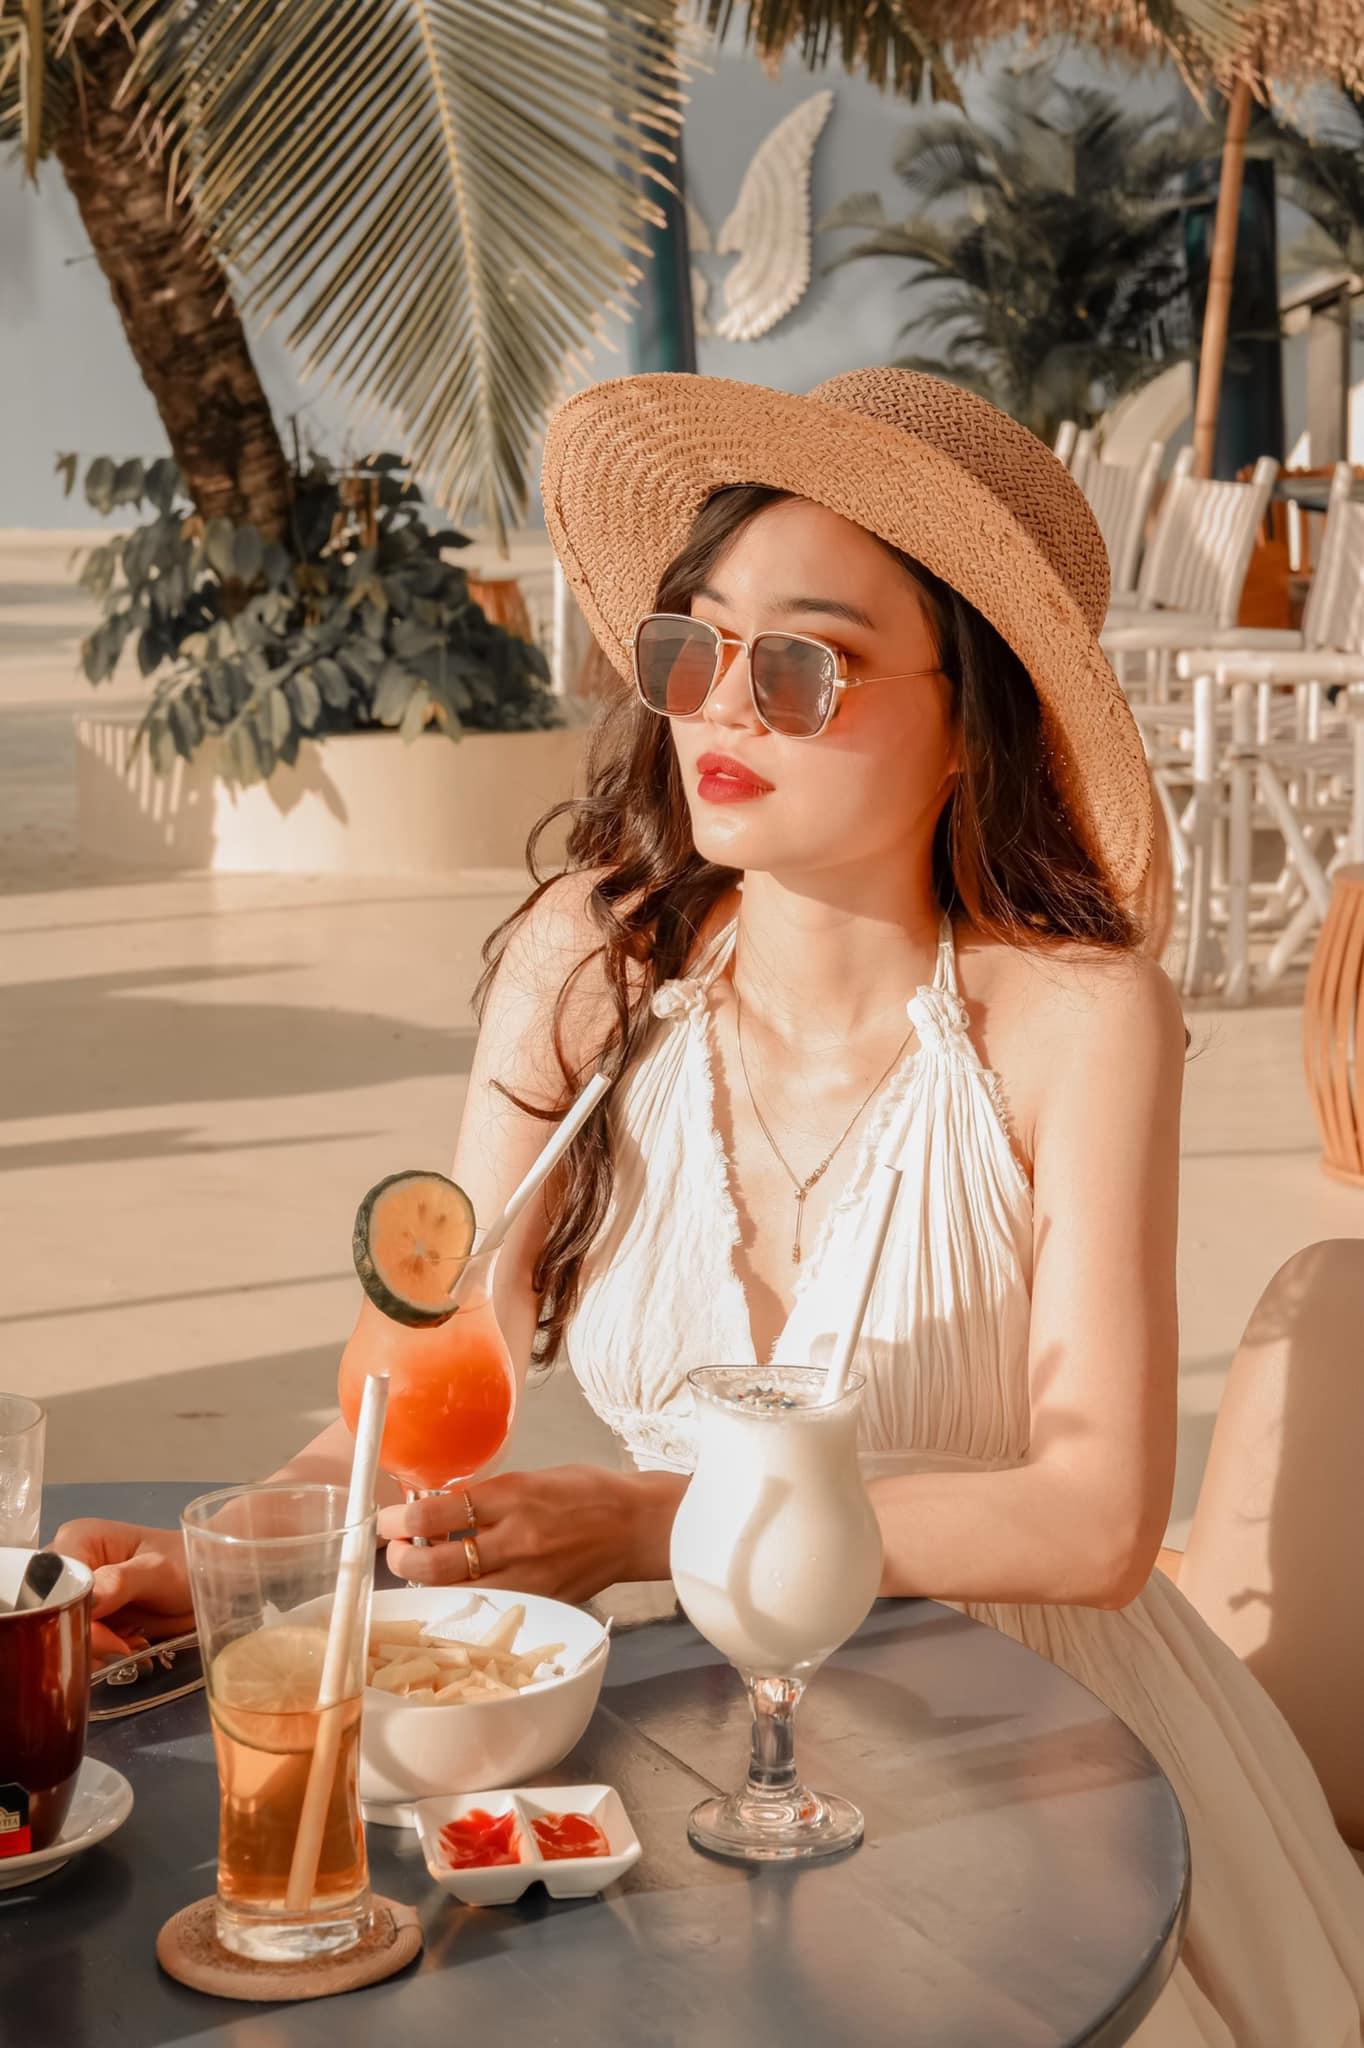 Review du lich phu quoc 4n3d cua hot girl xinh dep 17